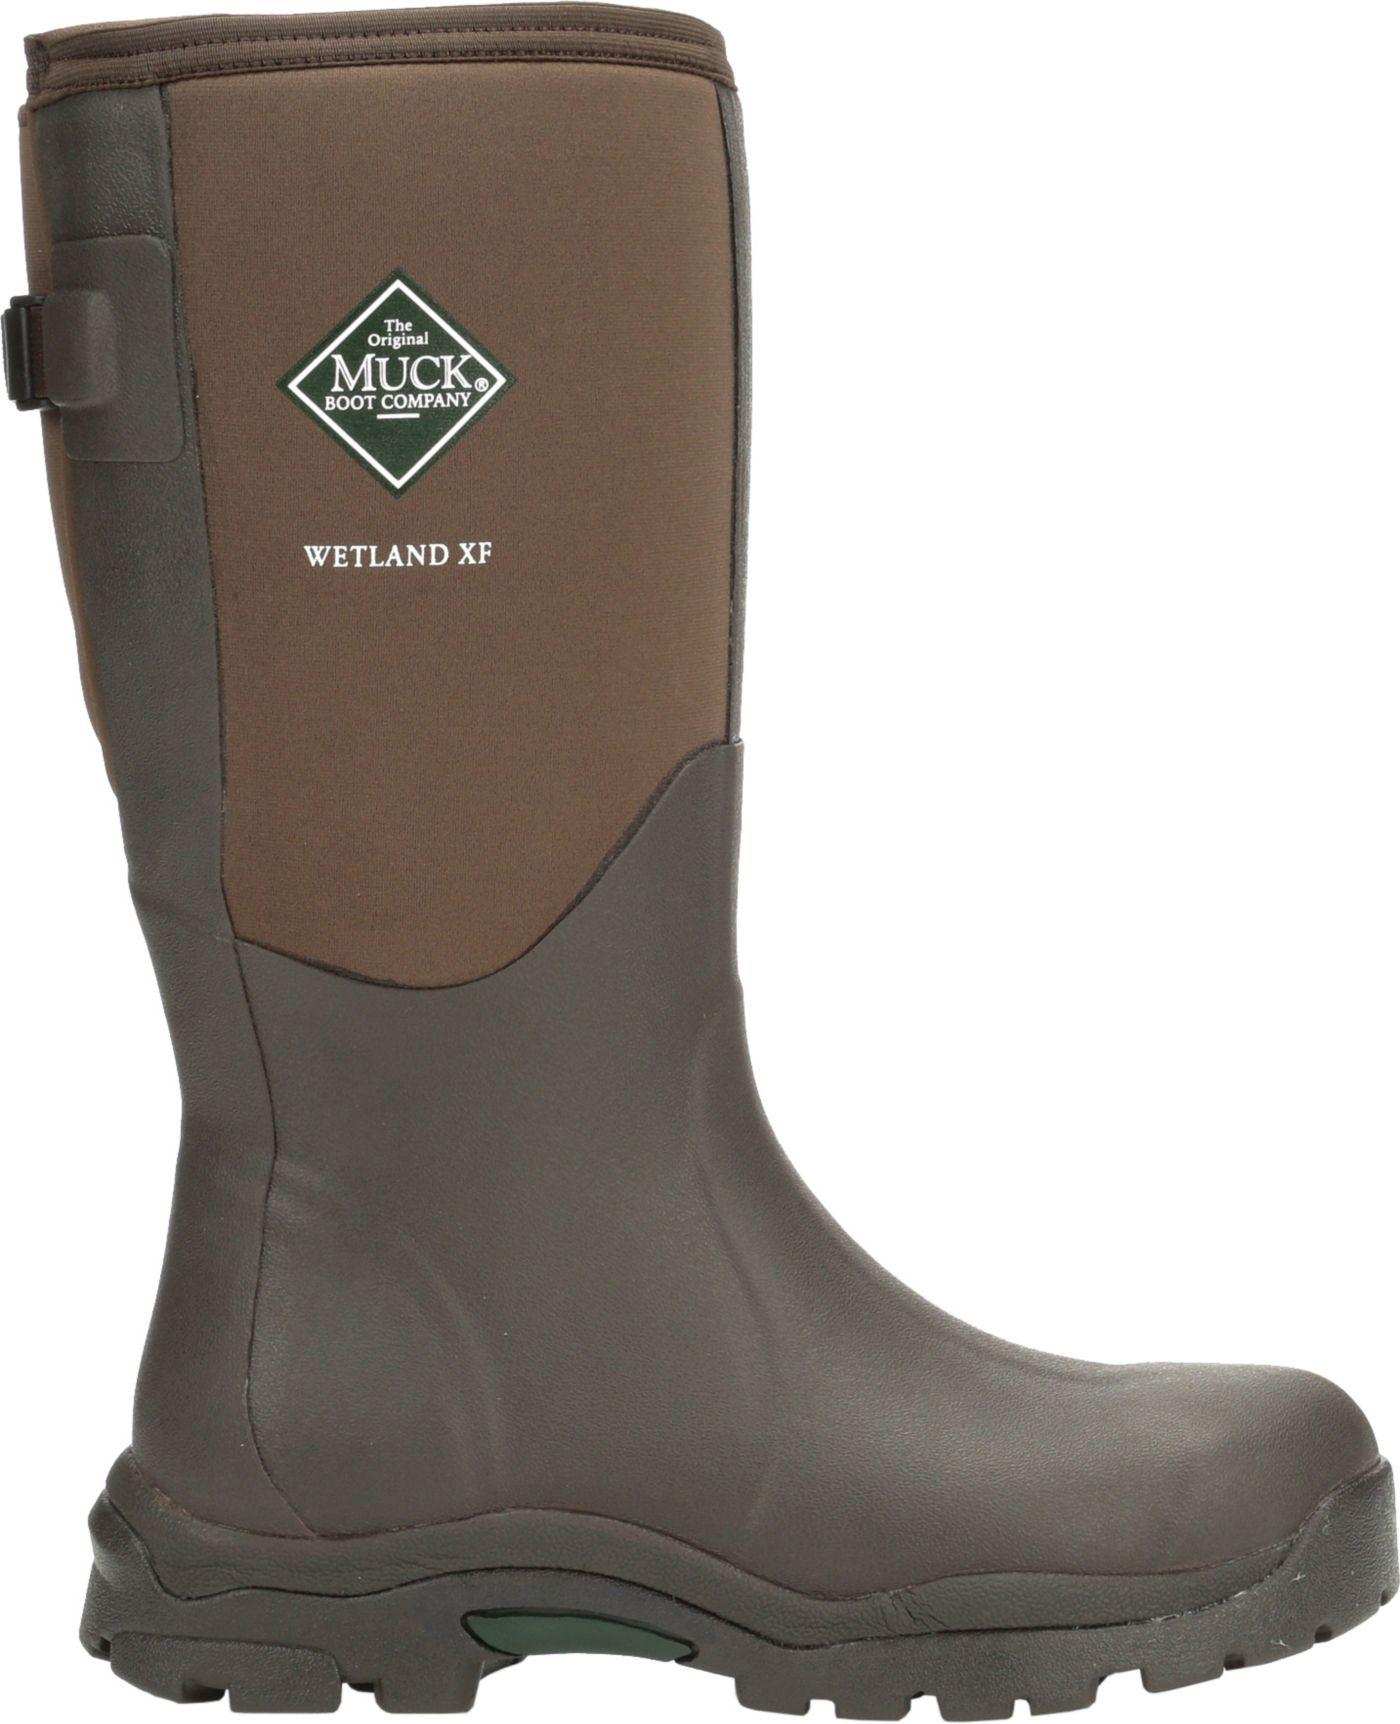 Muck Boots Women's Wetland Wide Calf Rubber Hunting Boots